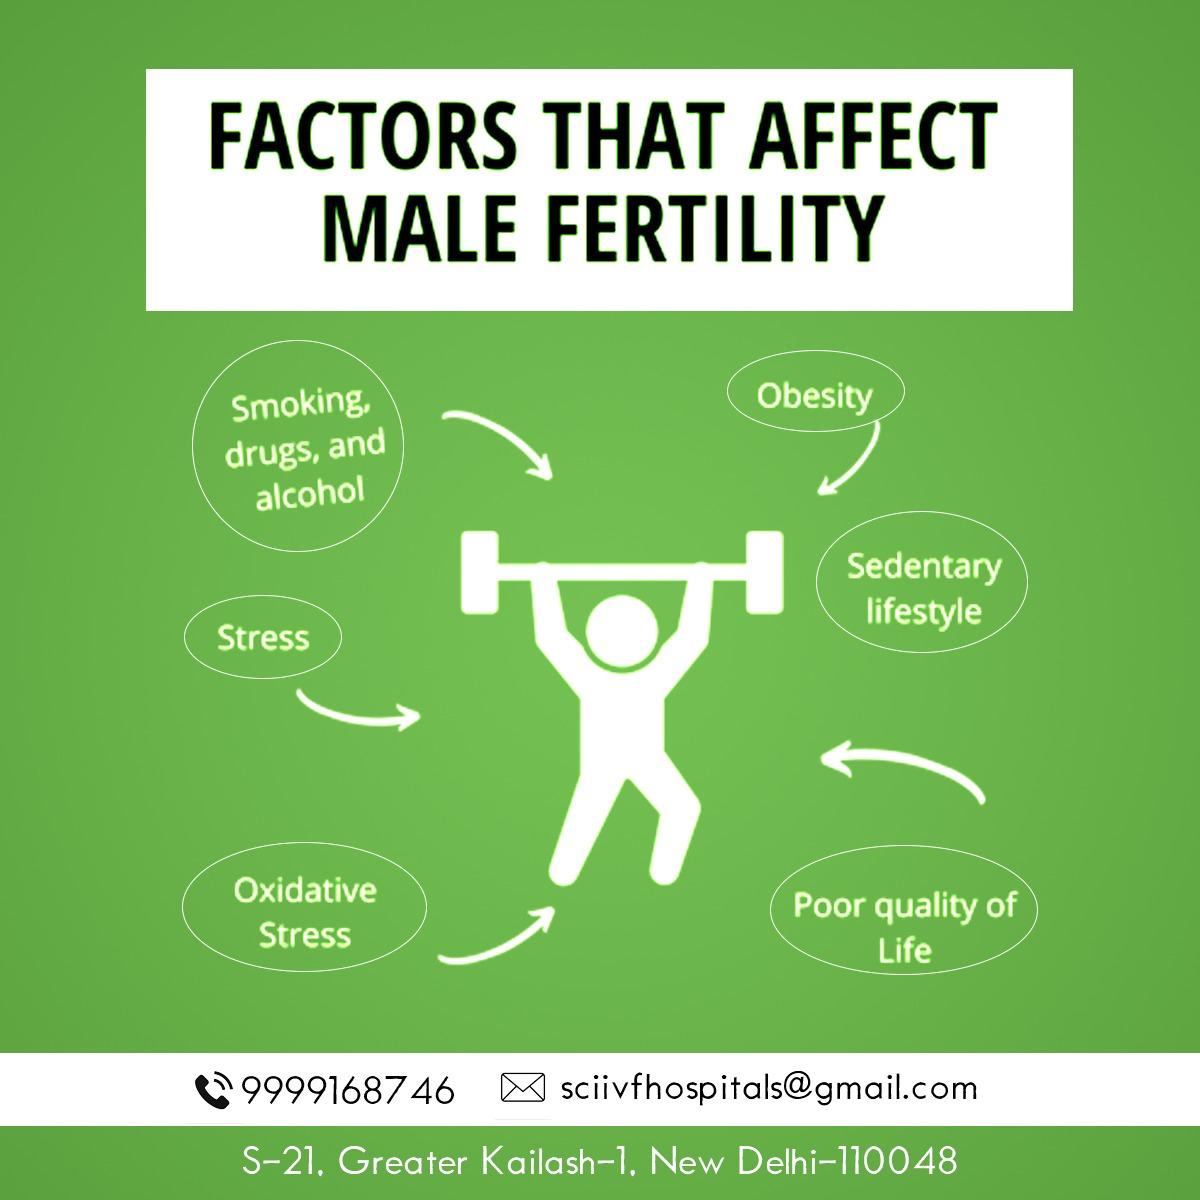 Factors that Influence Male Fertility